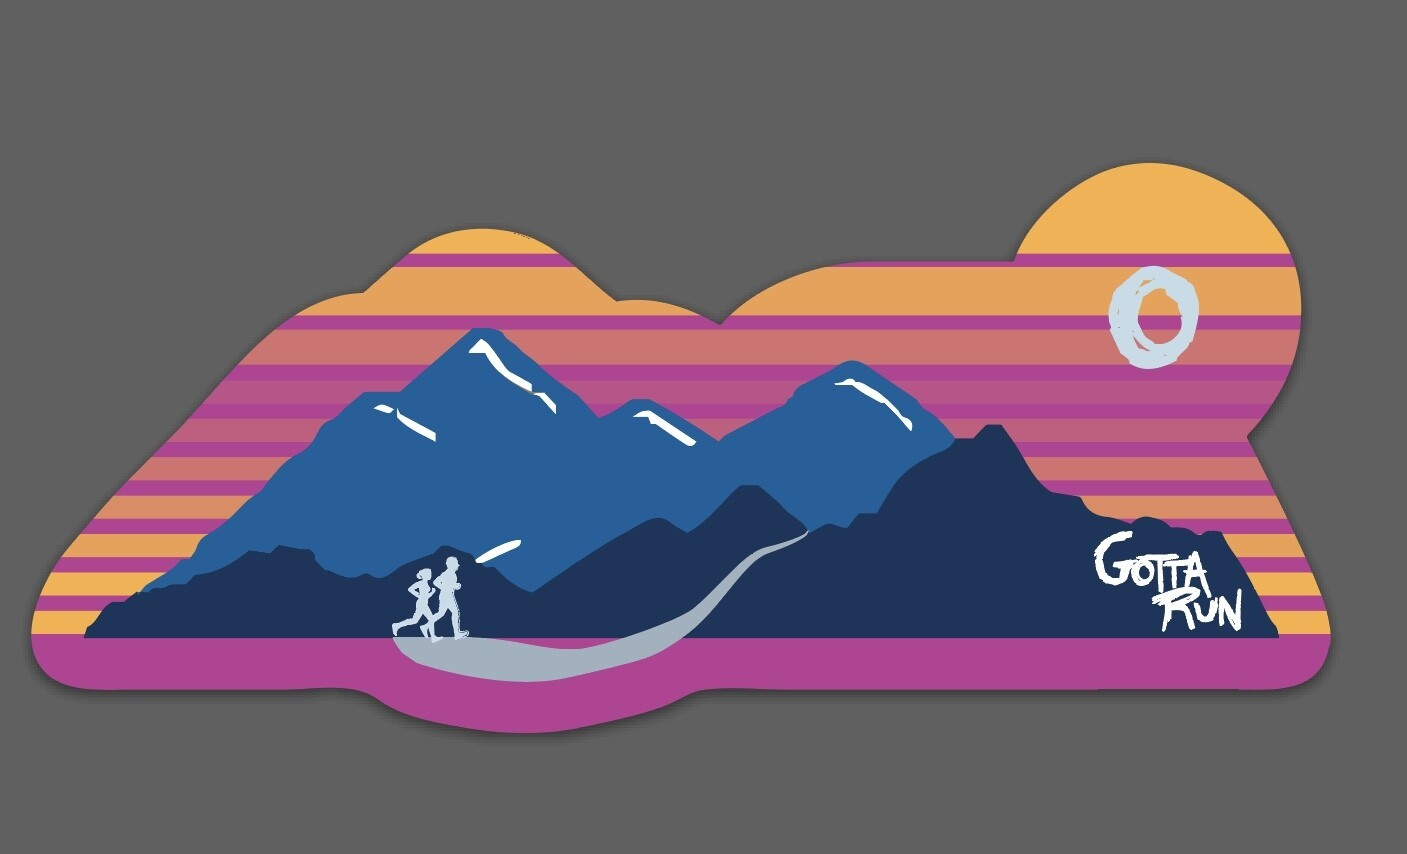 3-pack of Gotta Run Lifestyle Mountain Sunset Runner stickers